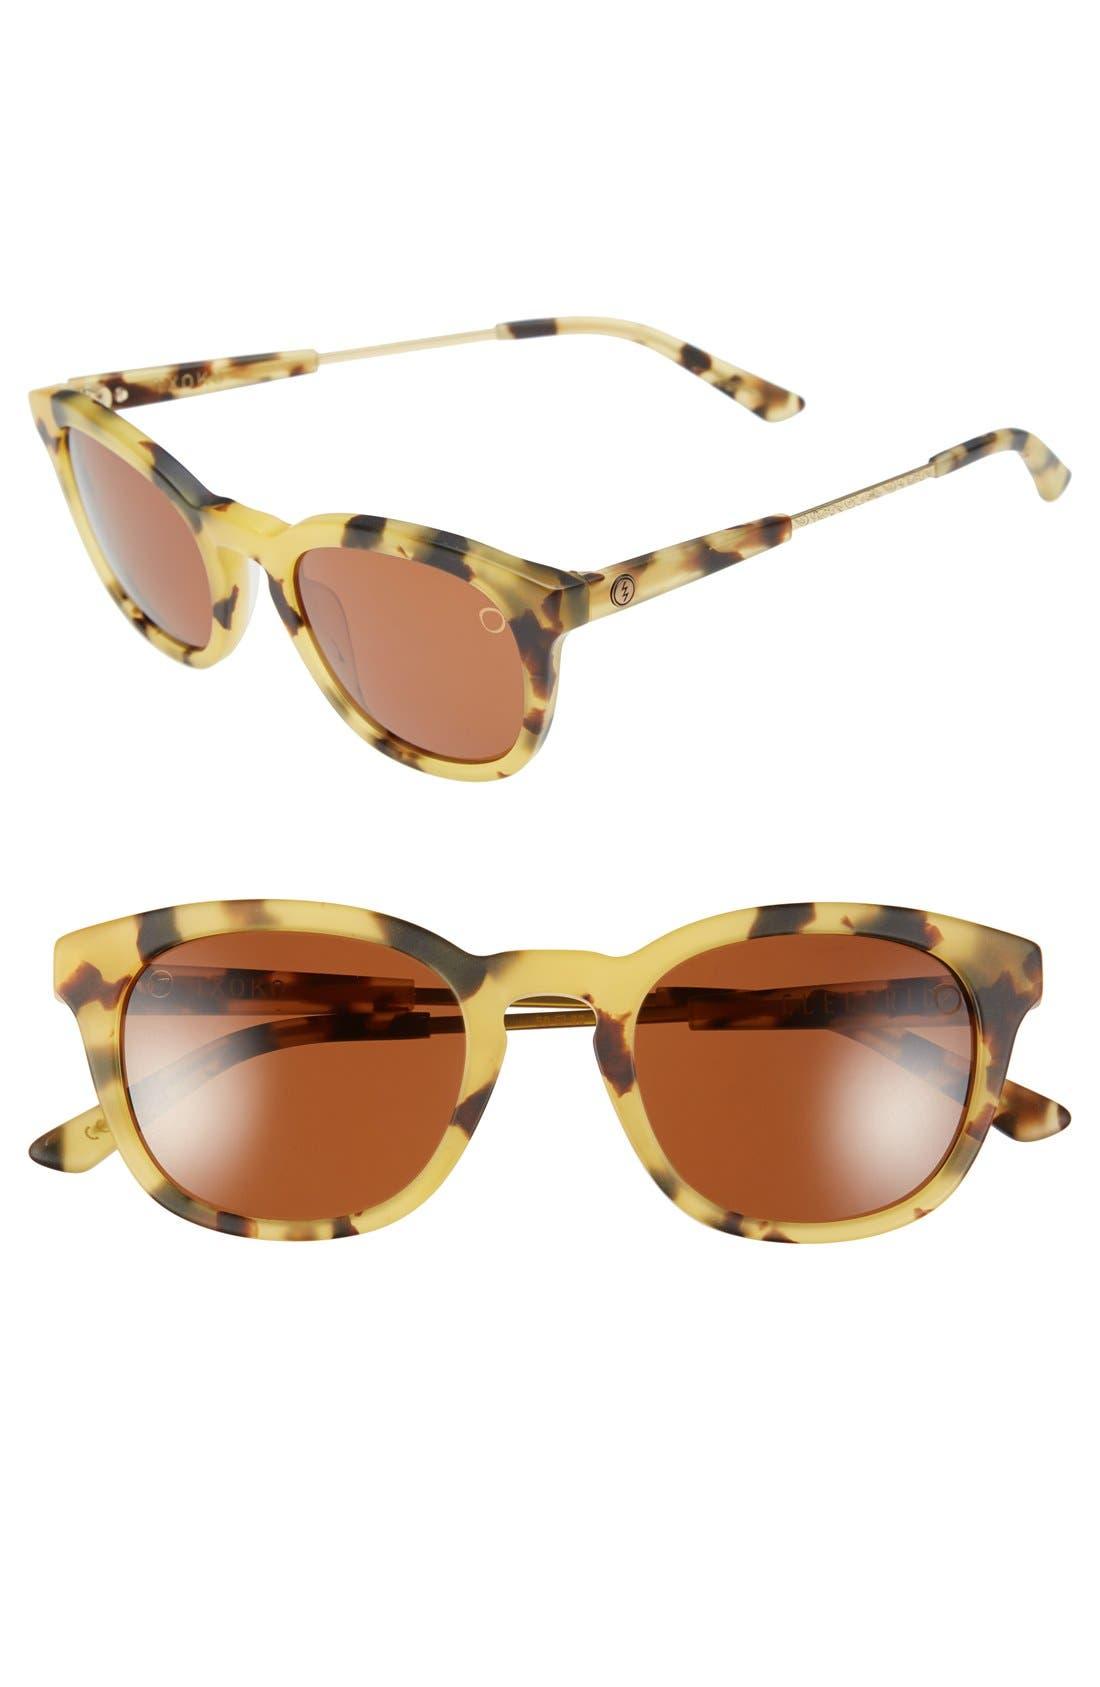 'Txoko' 50mm Sunglasses,                             Main thumbnail 1, color,                             MATTE SPOTTED TORTOISE/ BRONZE